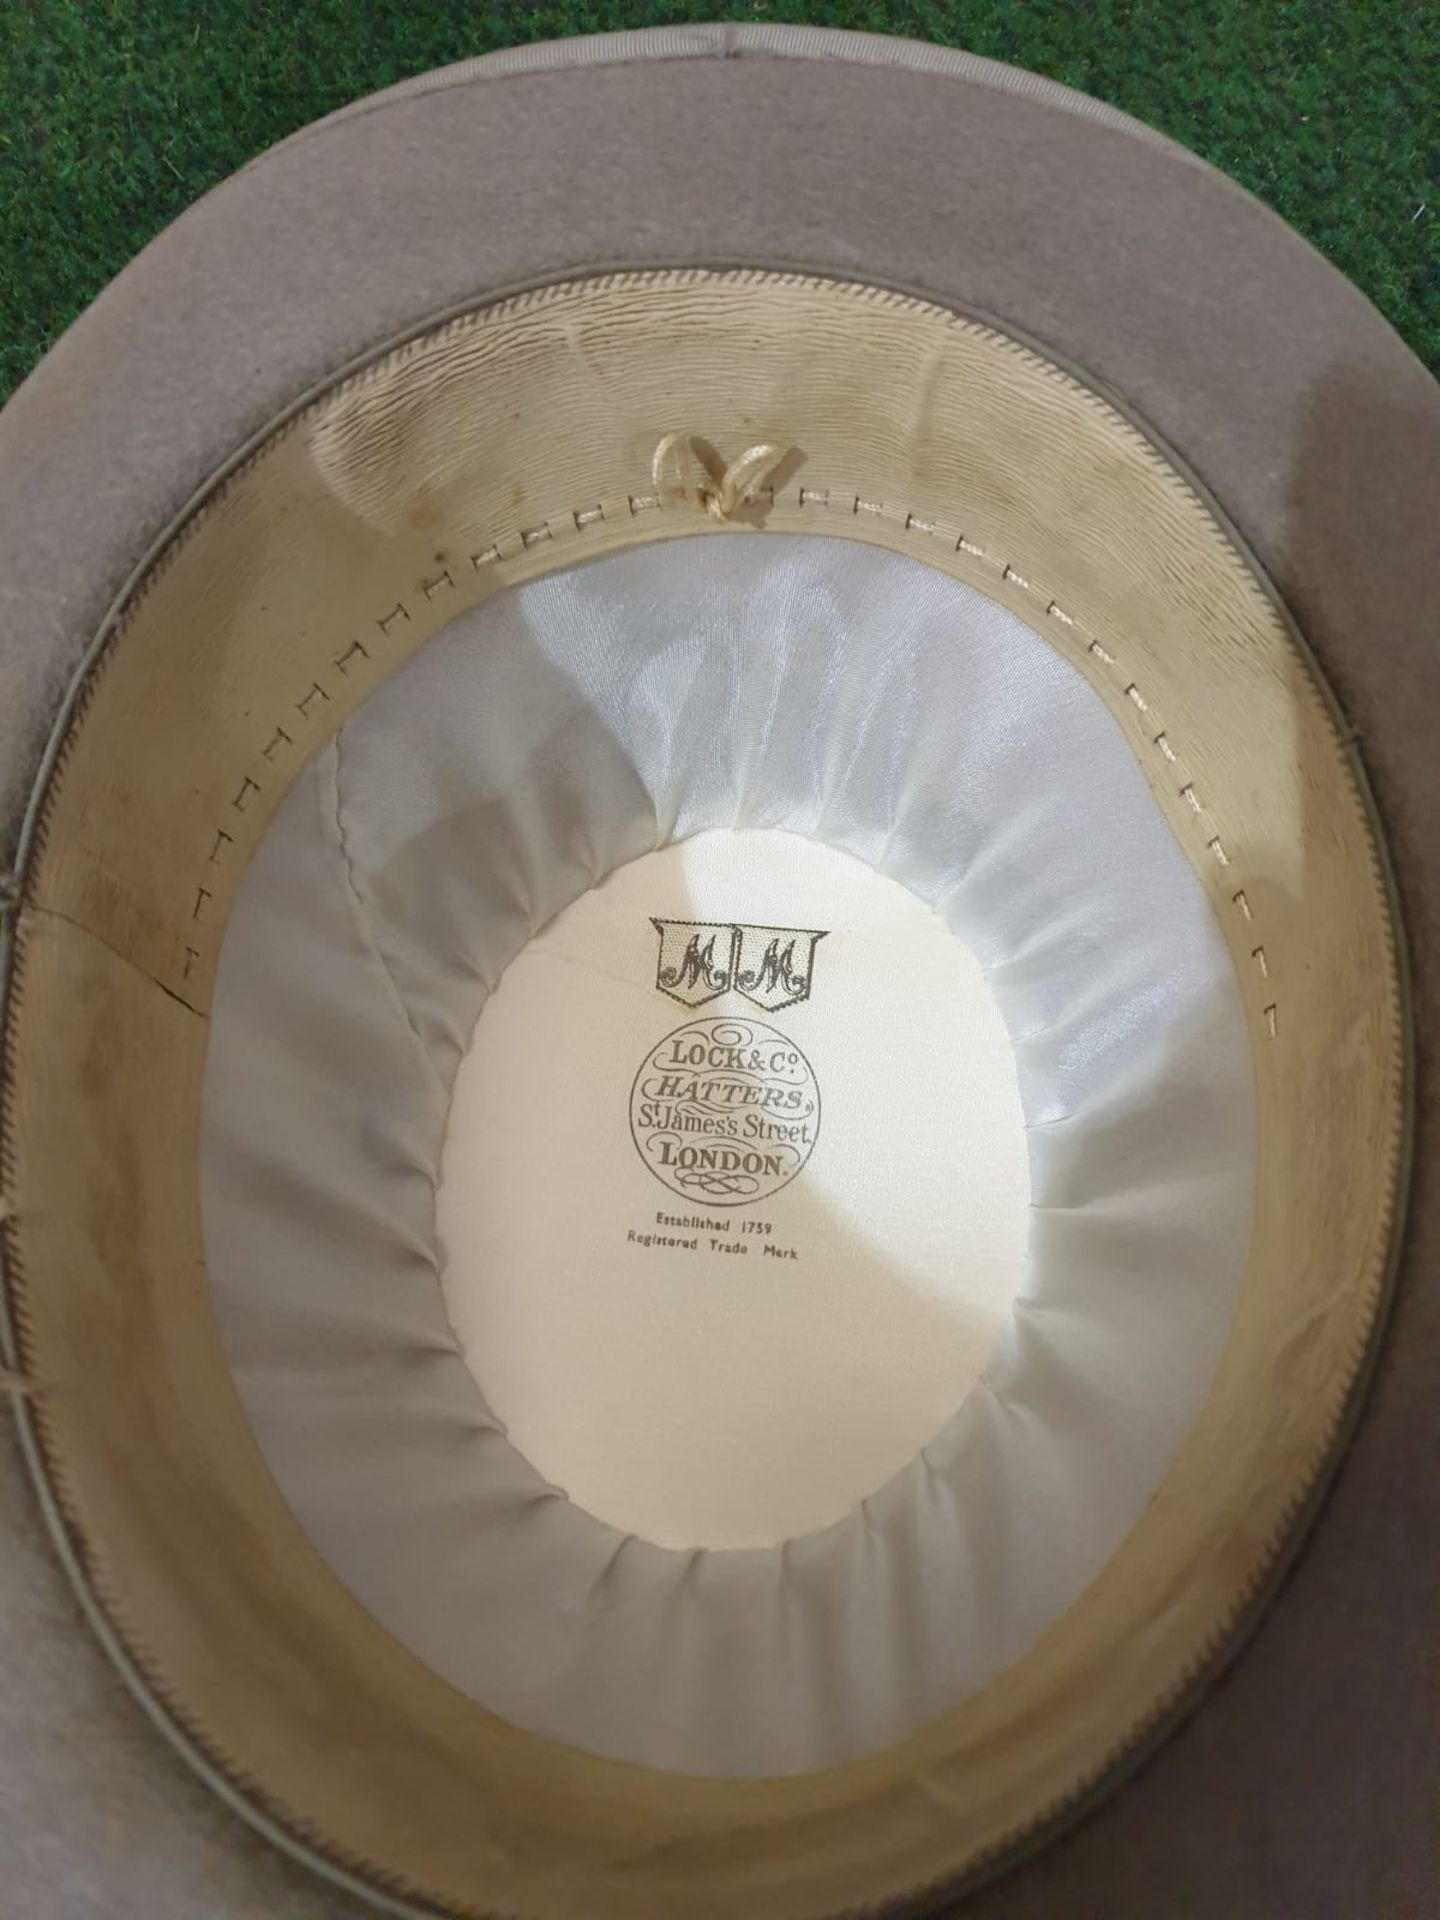 Walter Barnard & Son of Jermyn Street London Grey Bowler hat with cardboard box - Image 3 of 4